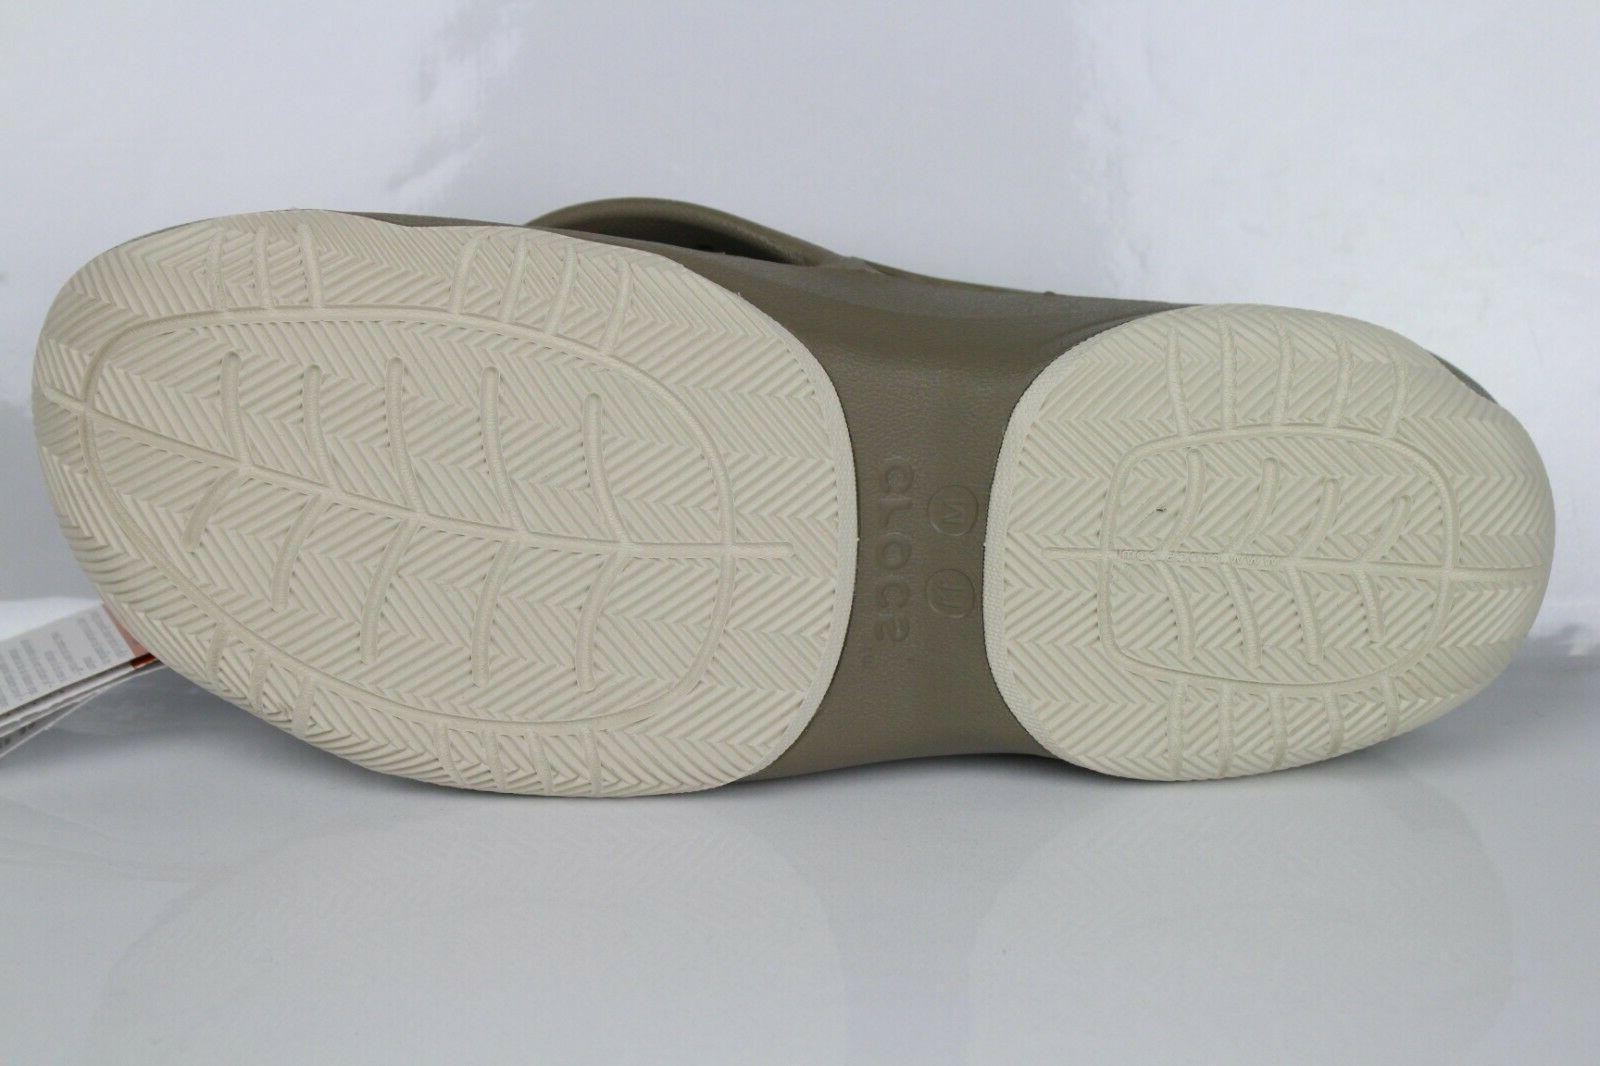 Crocs Men's Deck Flip Flops Khaki